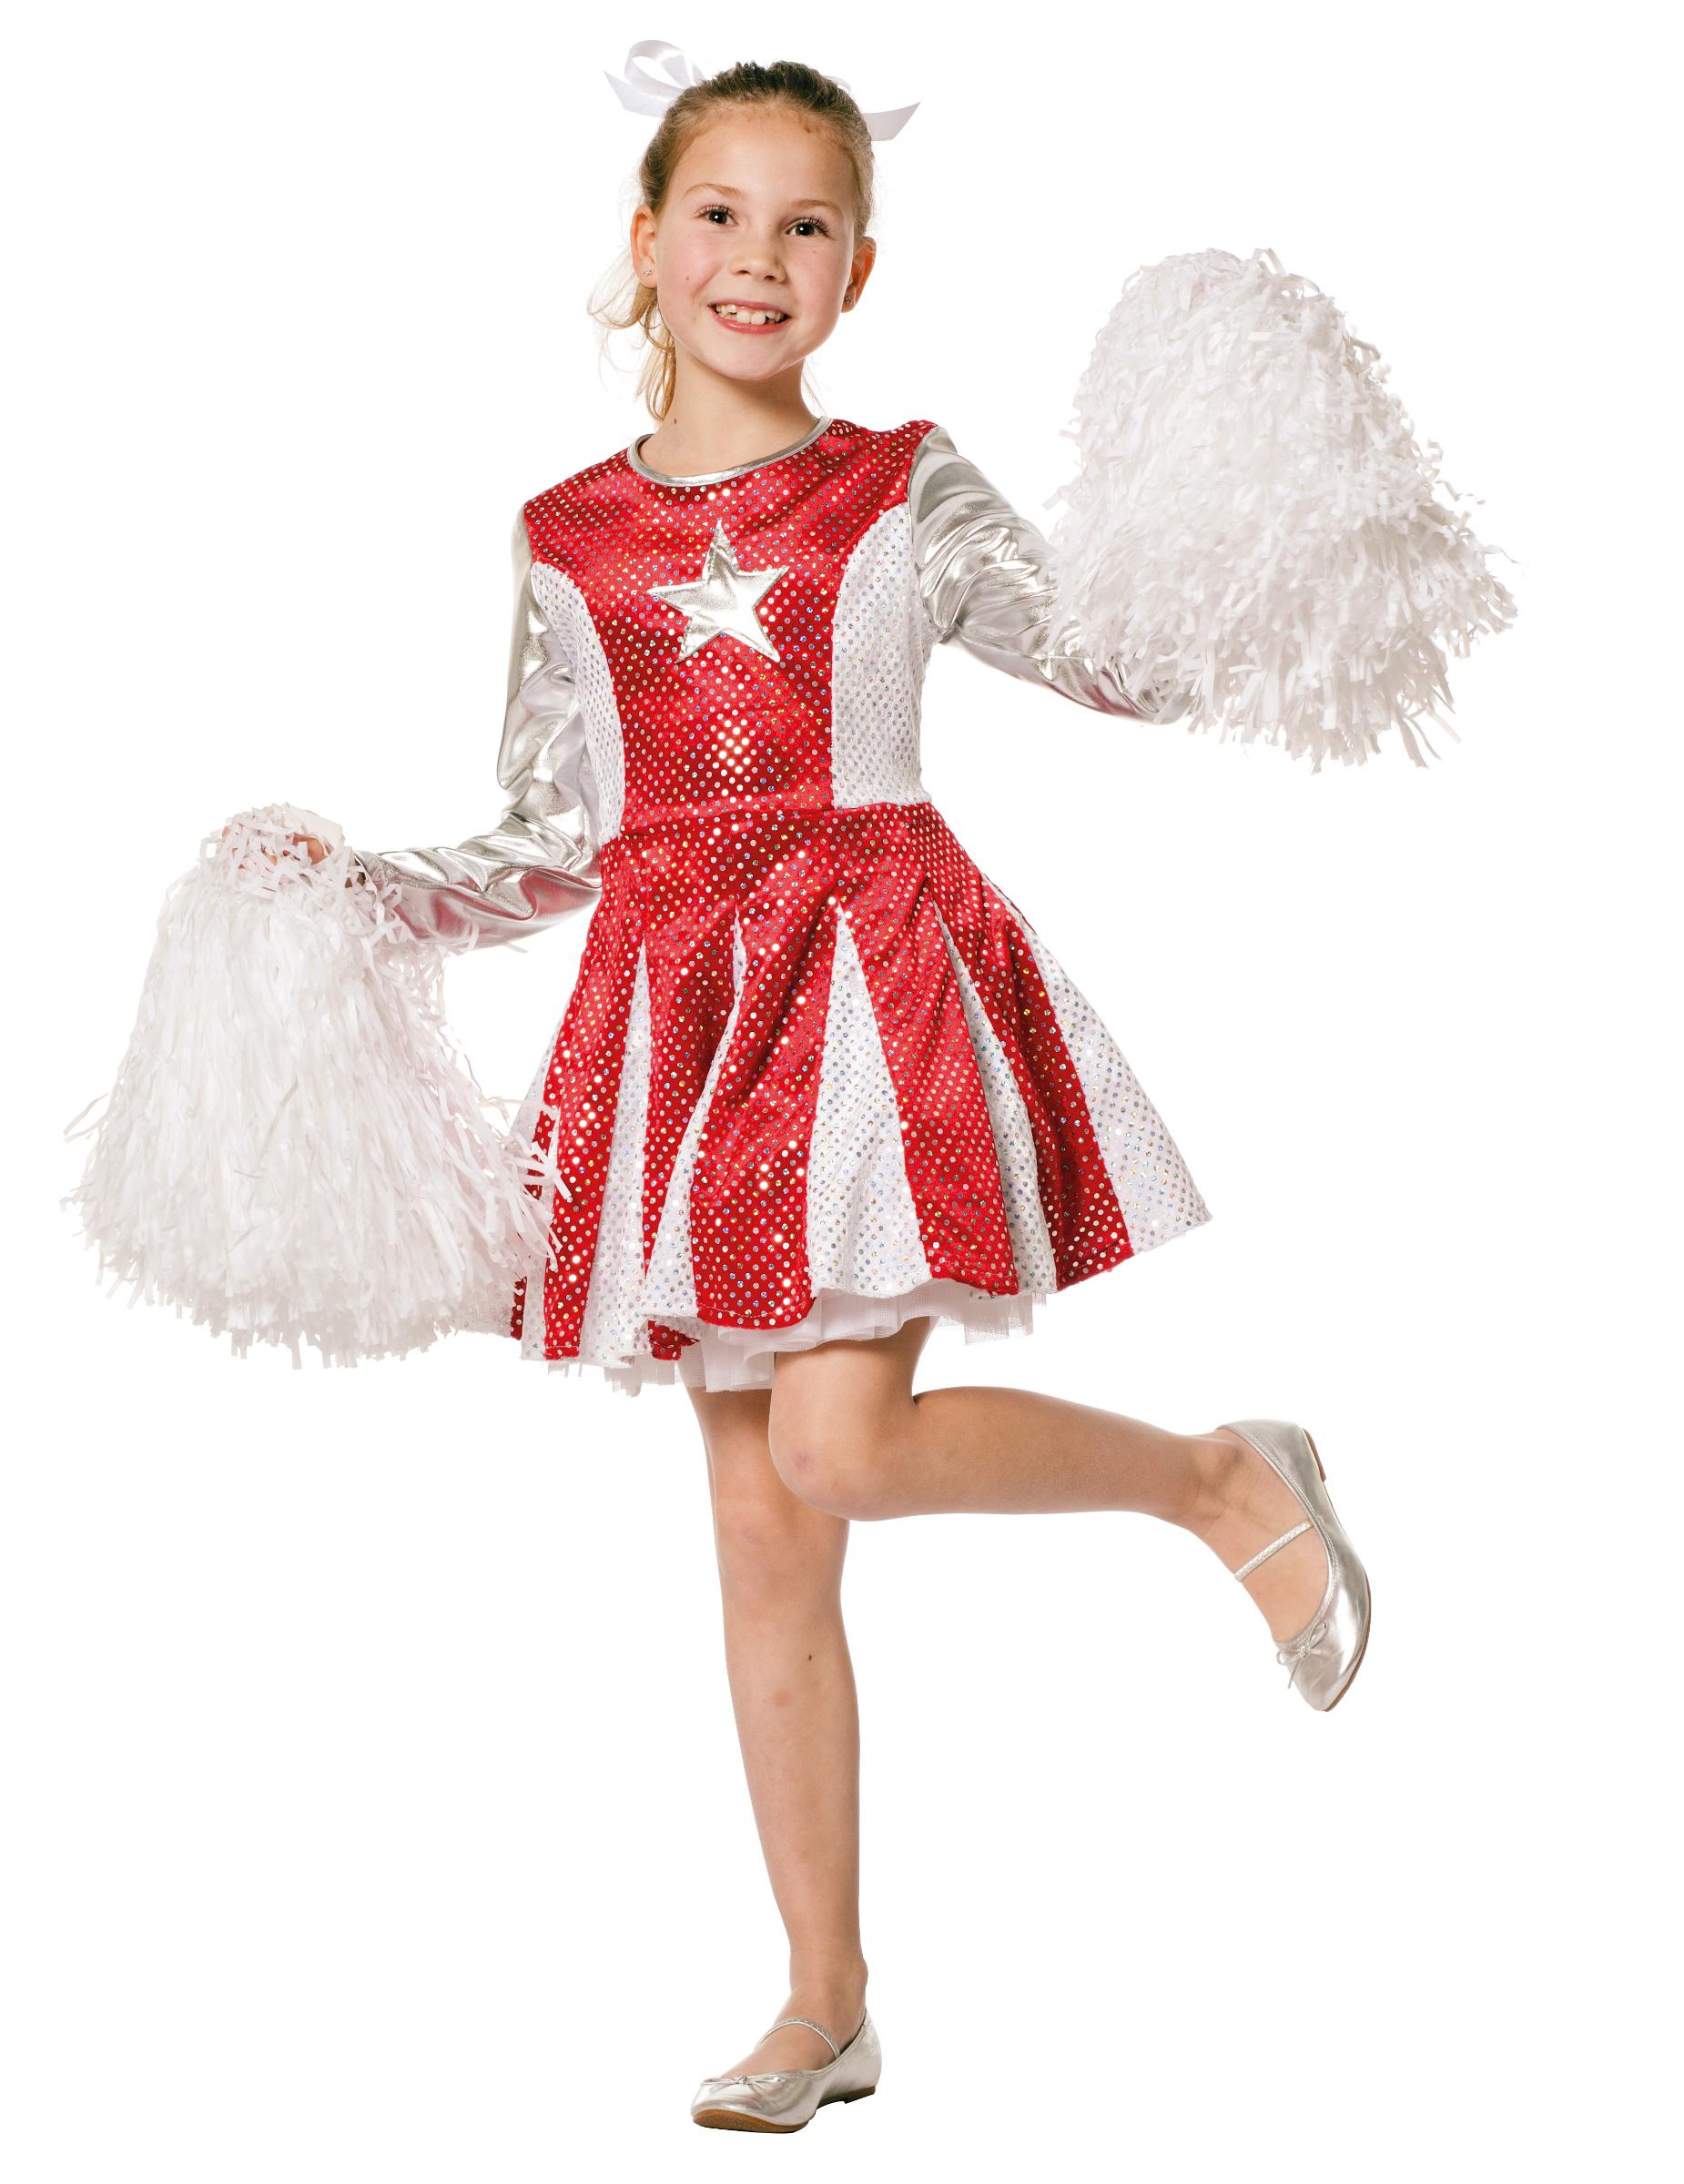 cheerleader kleid f r m dchen rot silber kost me f r kinder und g nstige faschingskost me vegaoo. Black Bedroom Furniture Sets. Home Design Ideas